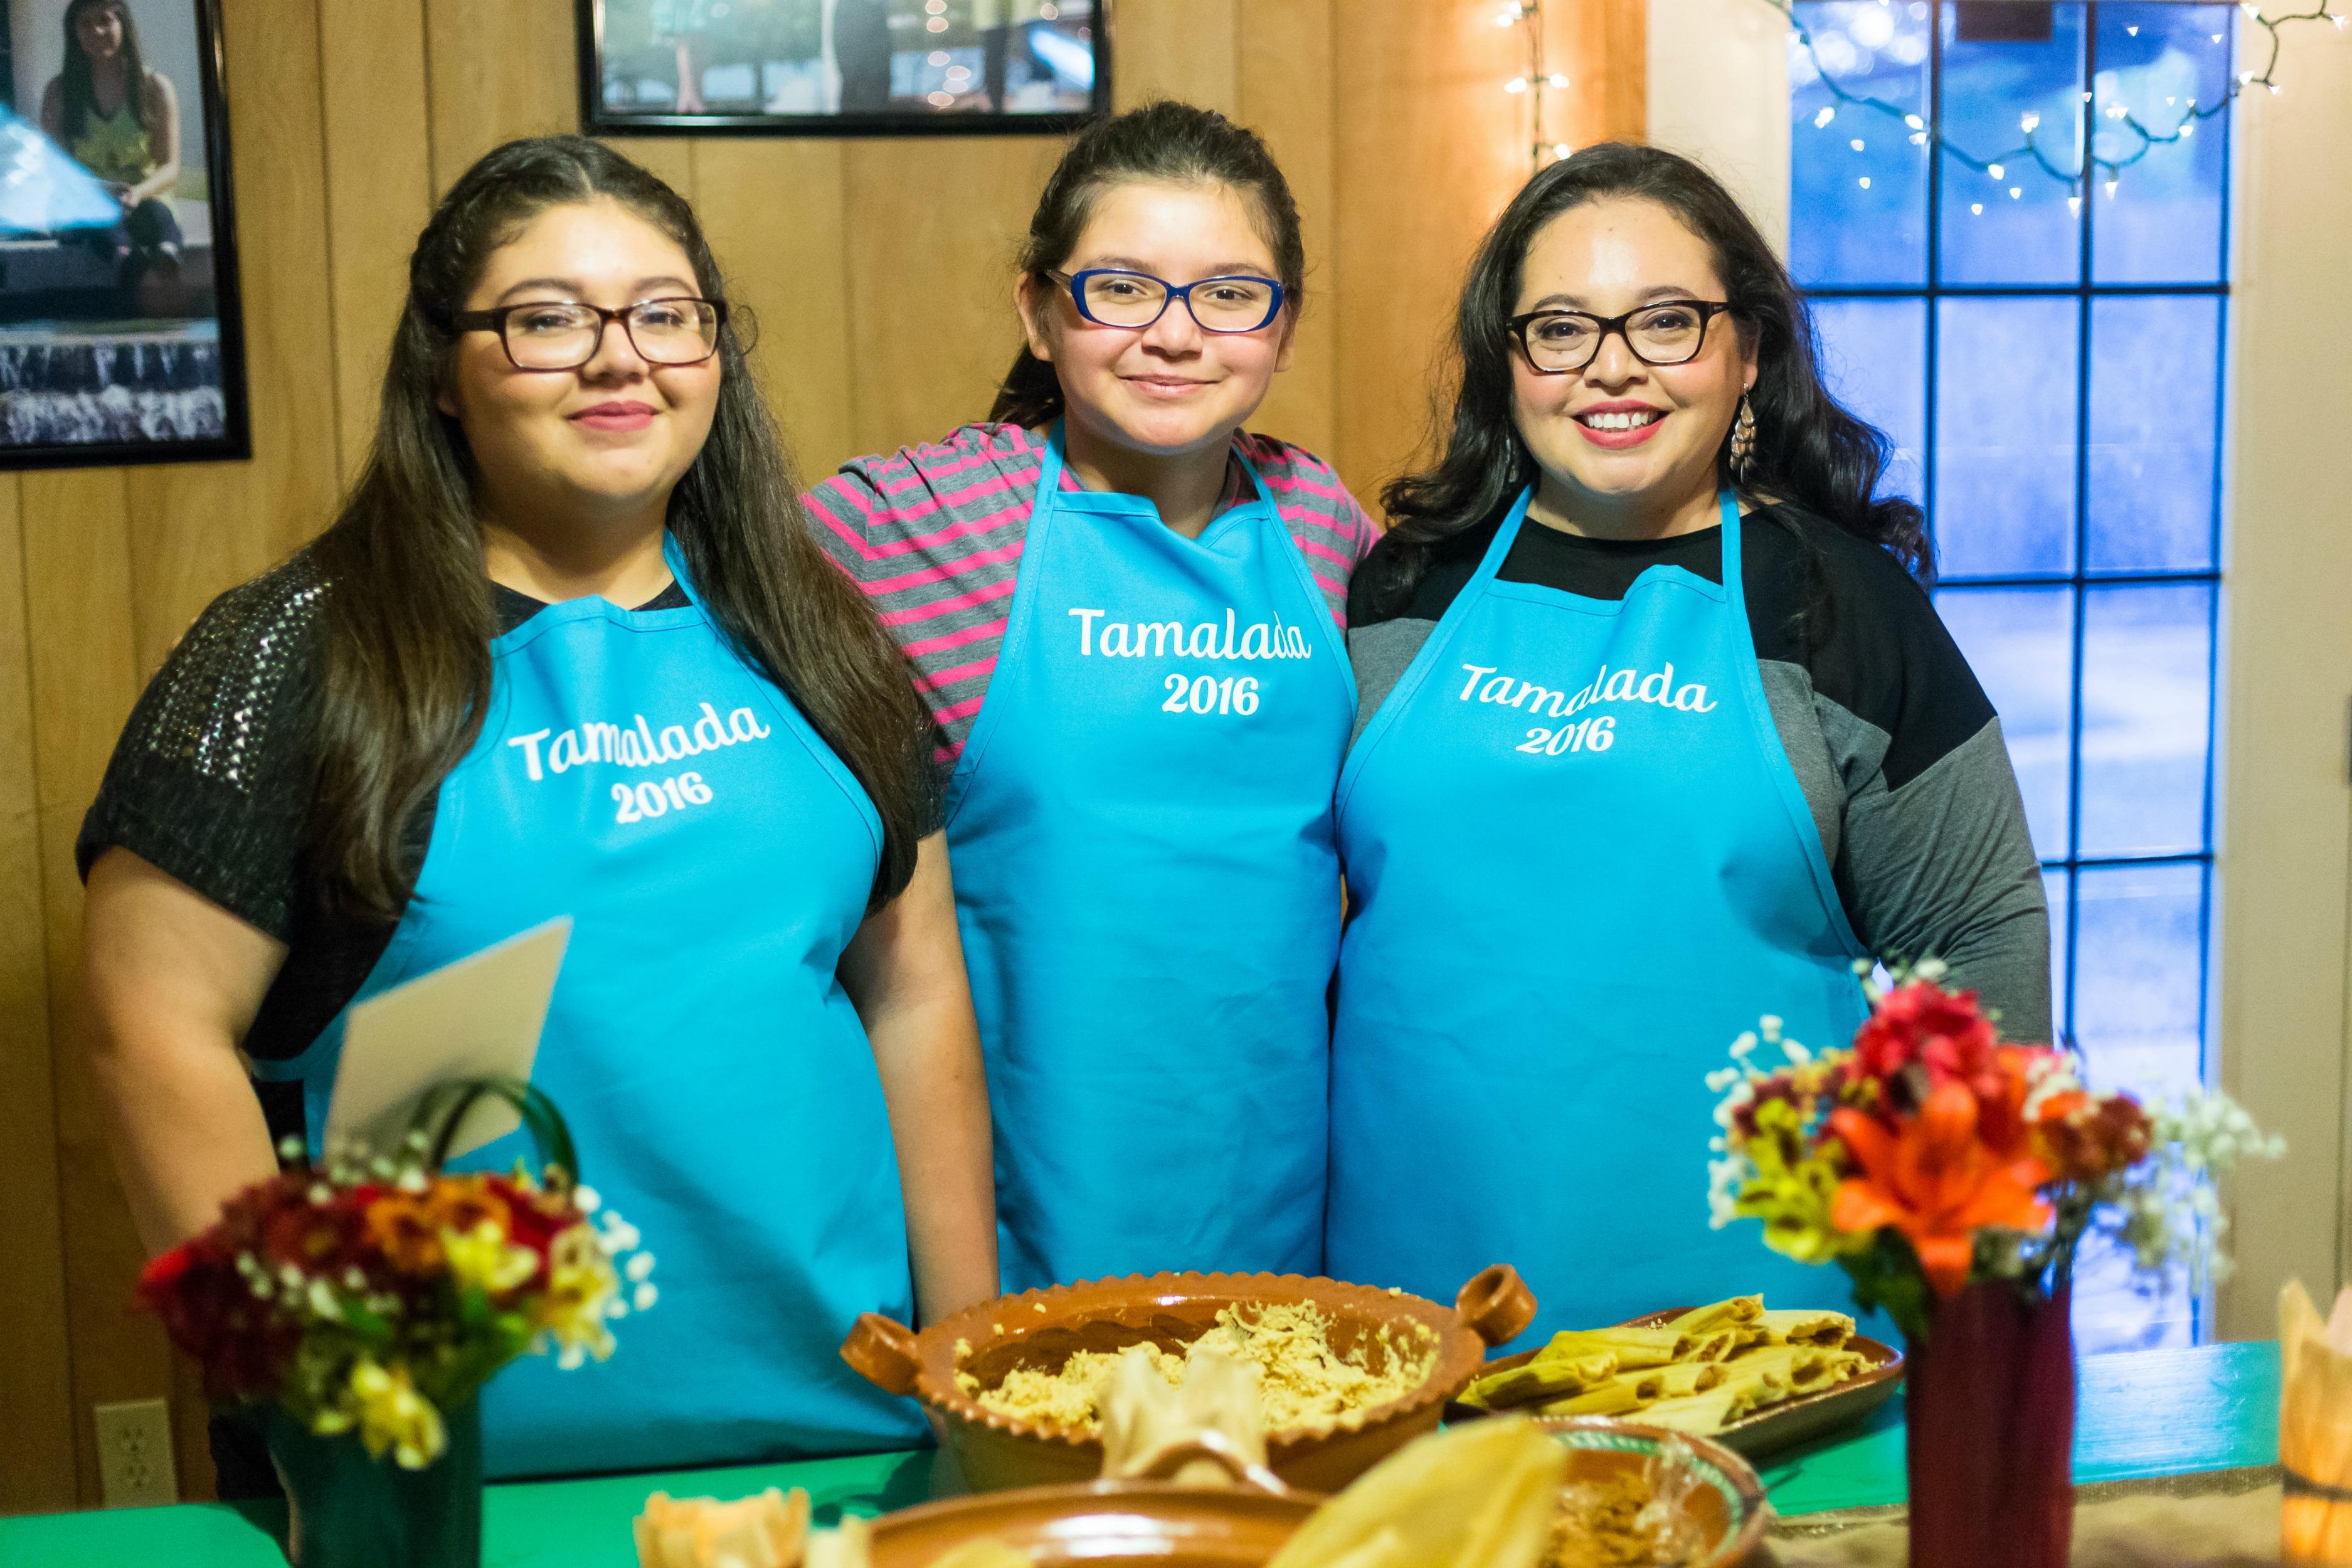 how-to-host-a-tamalada-familia-traditions-vianneyrodriguez-sweetlifebake